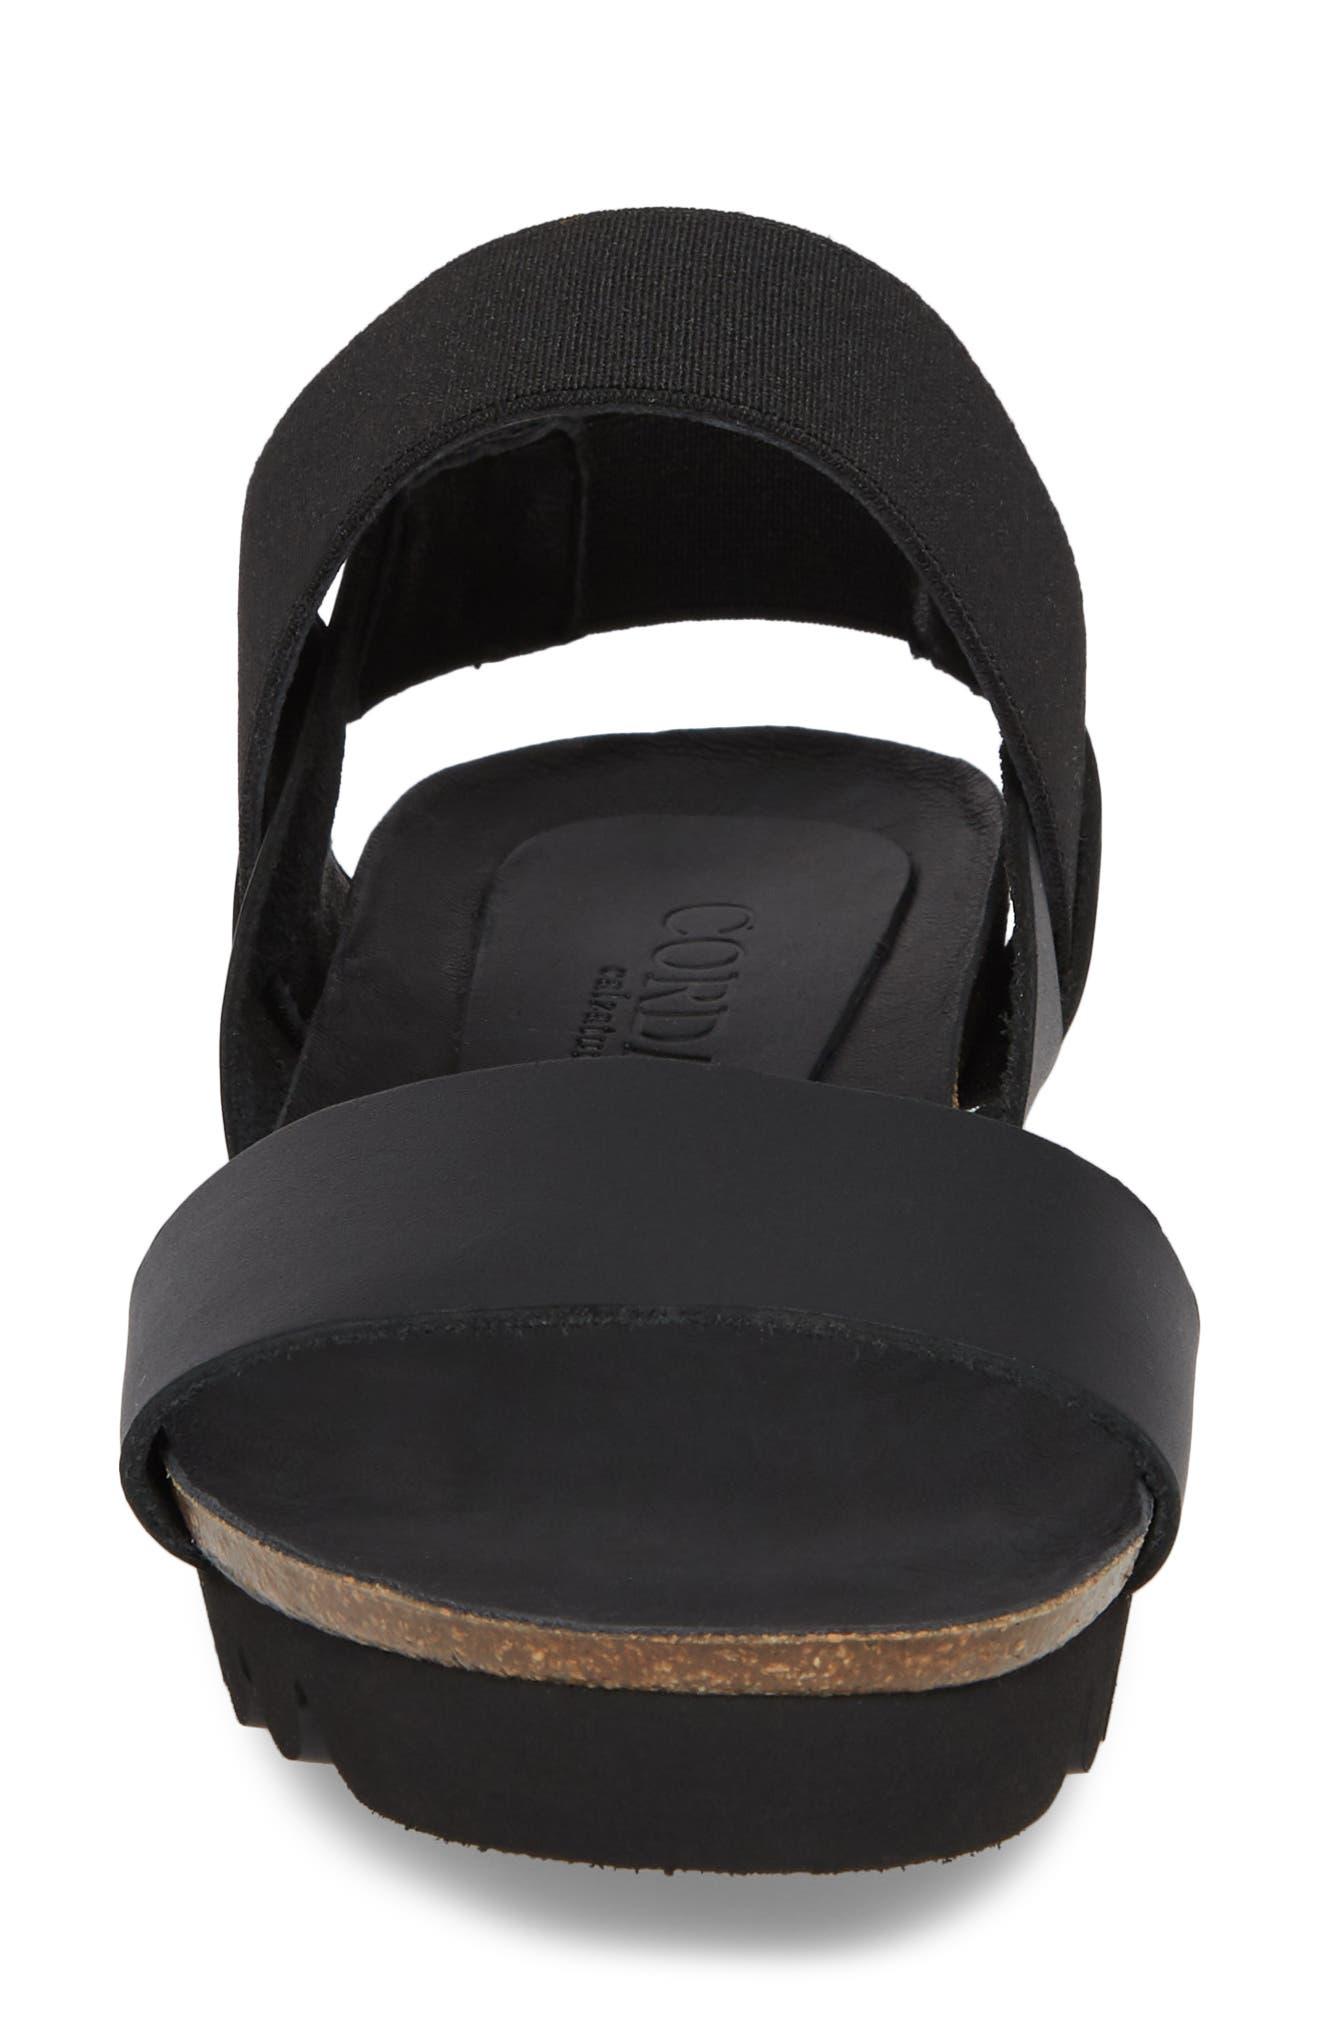 Luna Sandal,                             Alternate thumbnail 4, color,                             Black Leather